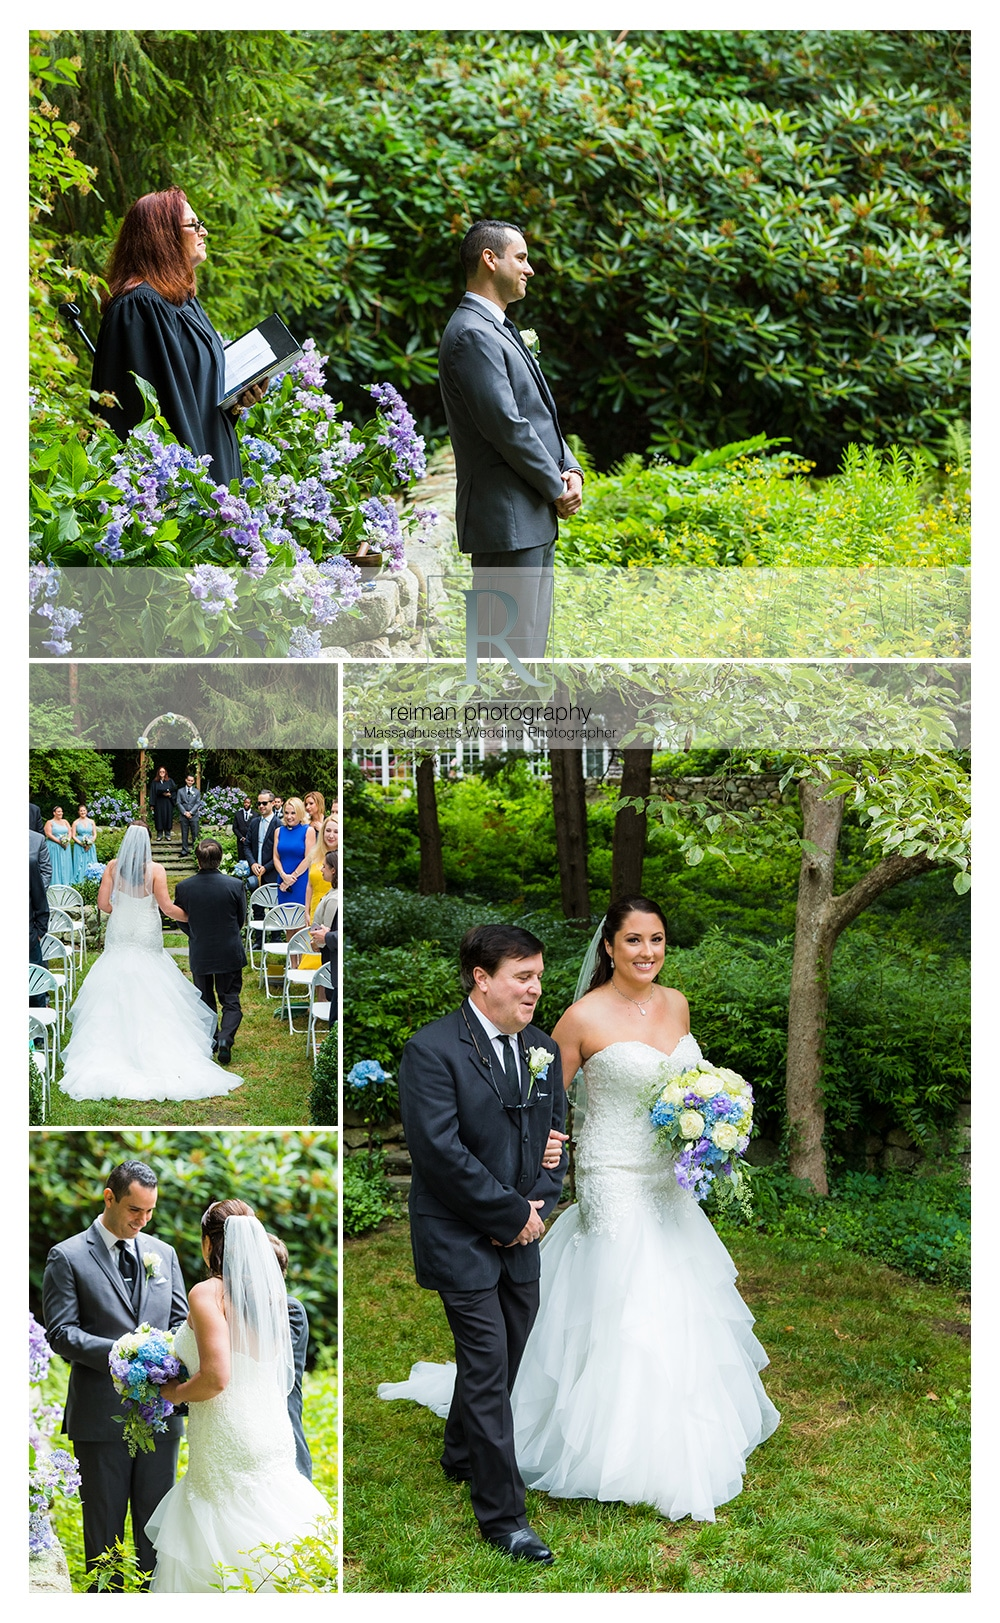 Plimoth Plantation Wedding, Summer, Reiman Photography, Plymouth, Massachusetts, July